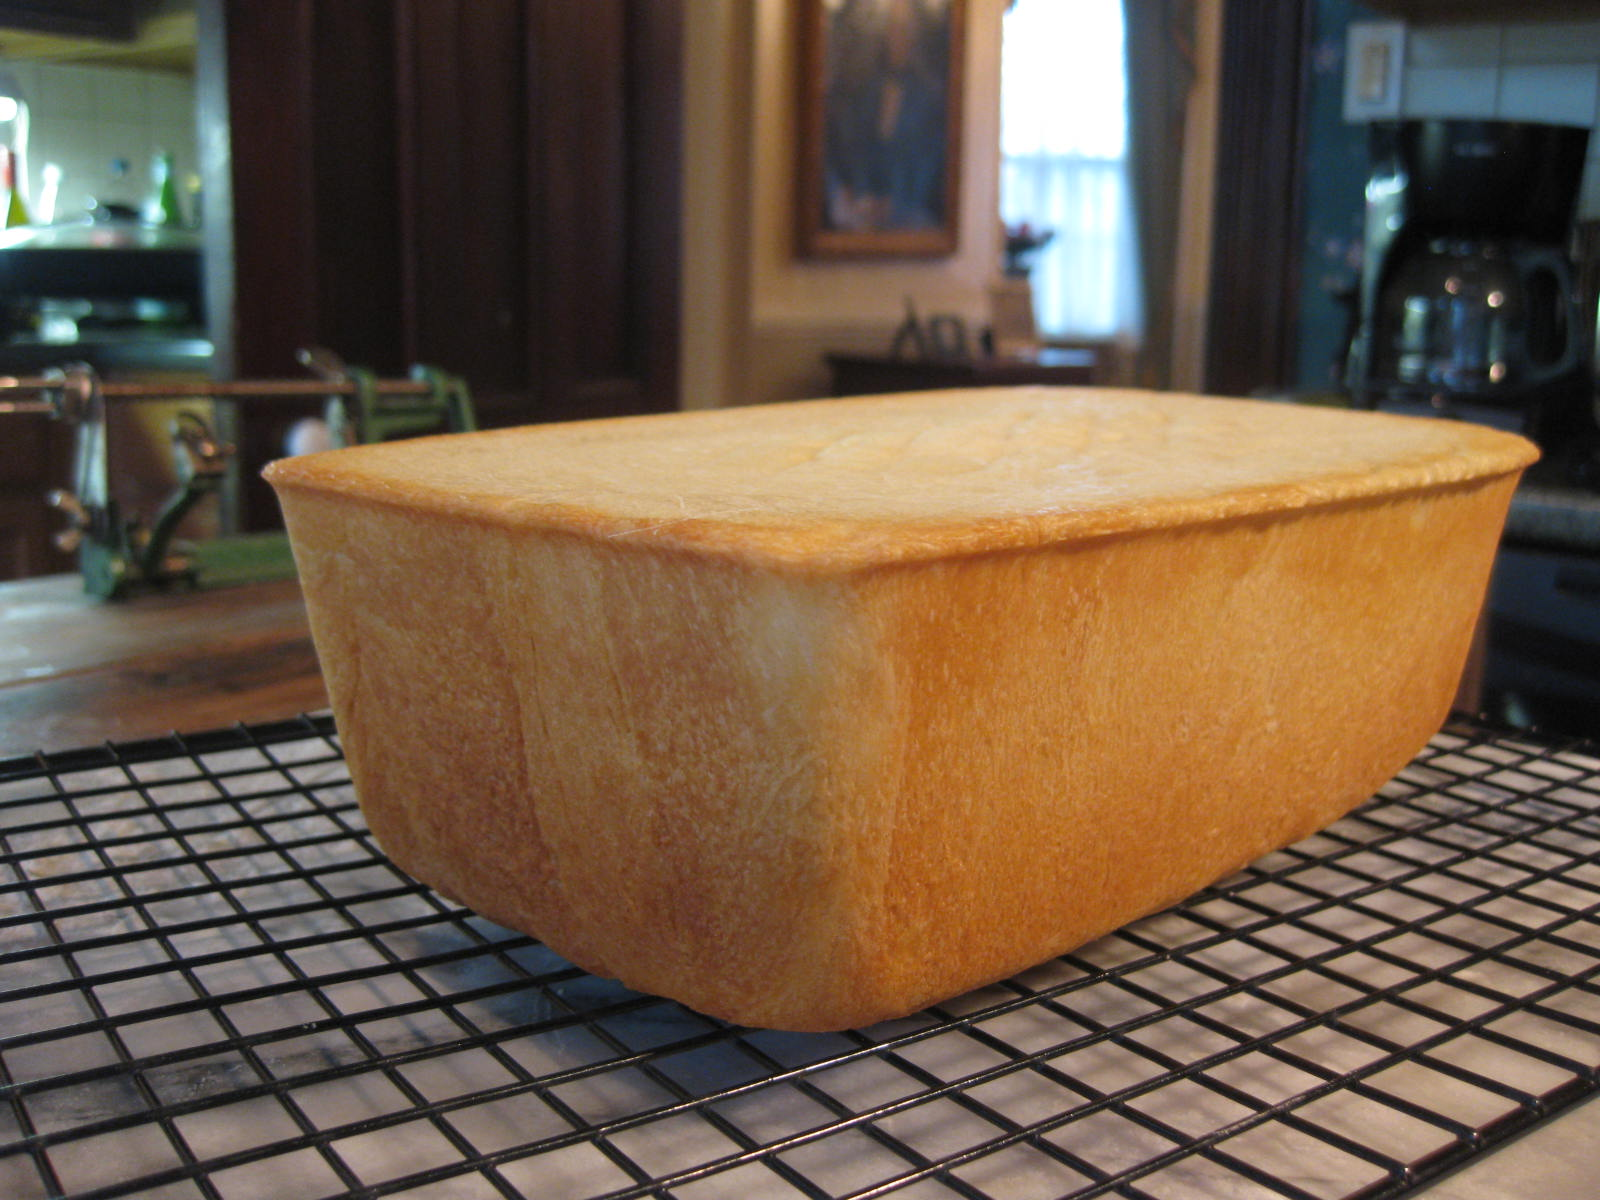 Pain de Mie: French Sandwich Bread